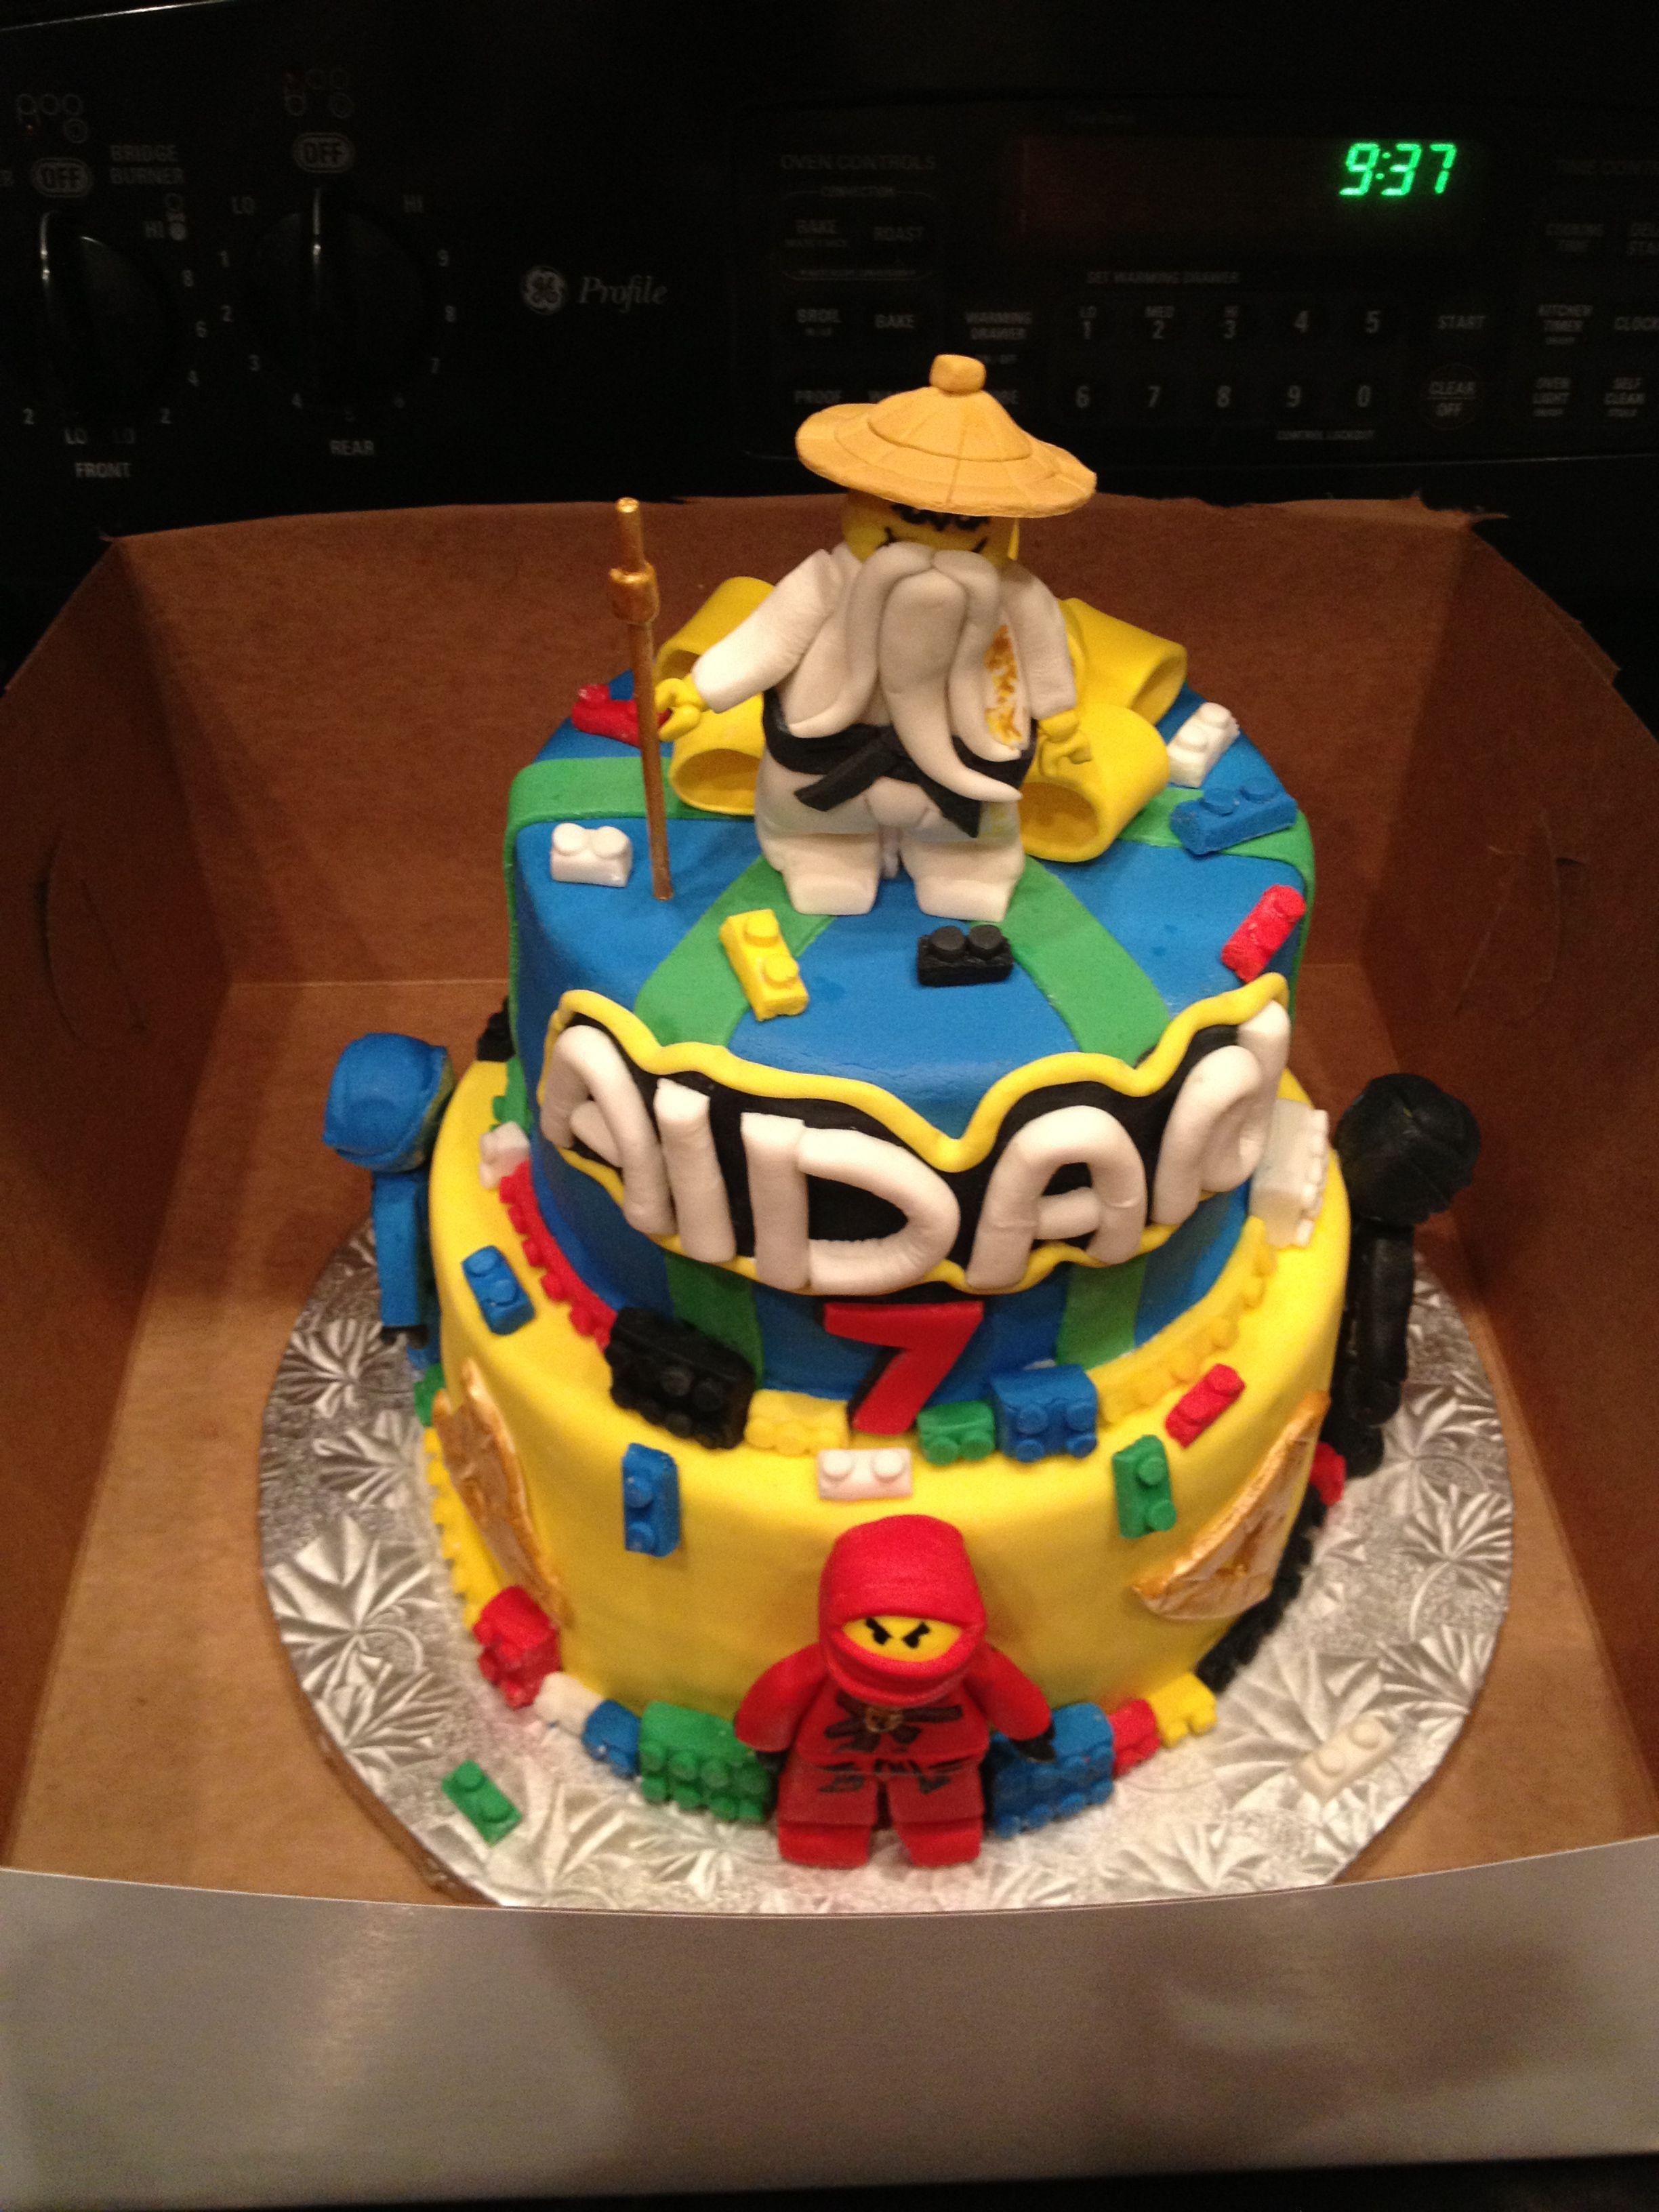 Aidans 7th birthday cake 7th birthday cakes cake